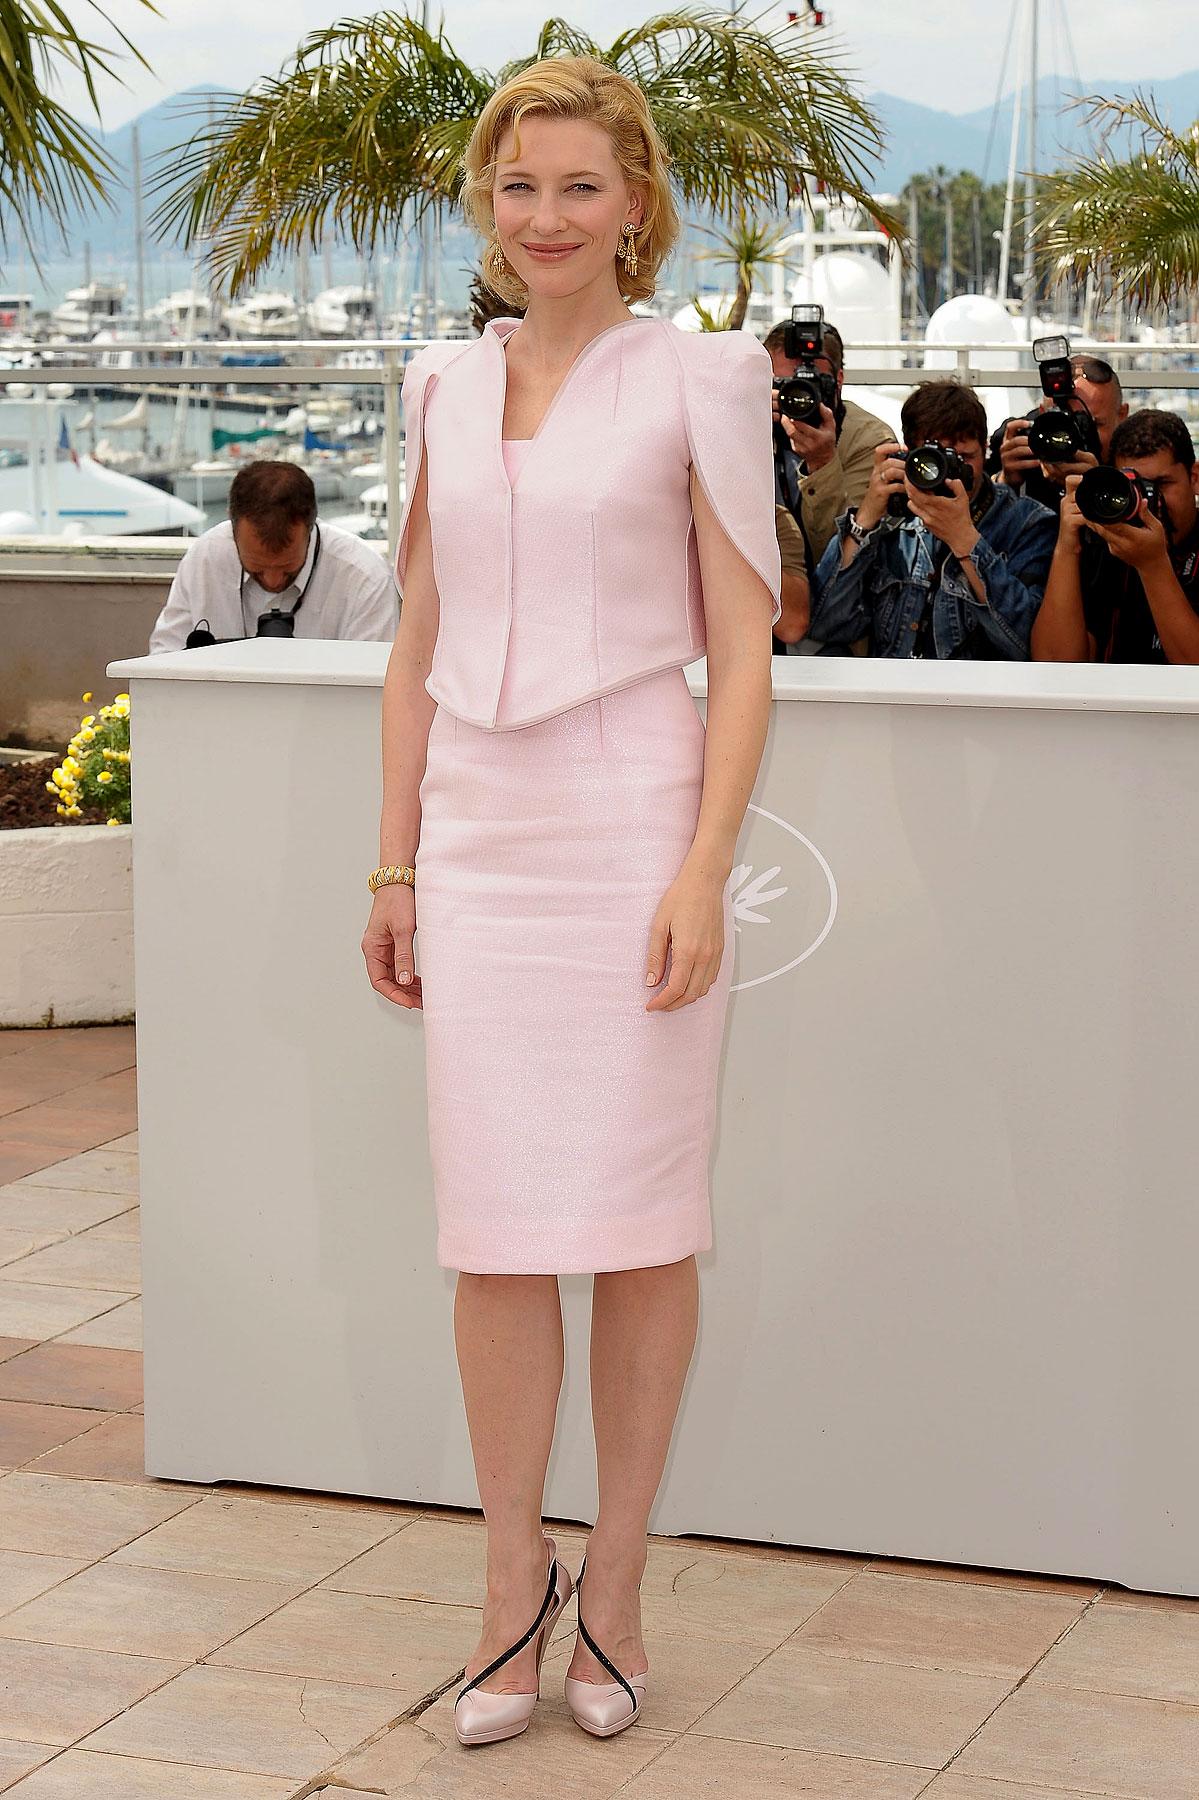 Cate Blanchett Wears Bubblegum Pink (PHOTOS)